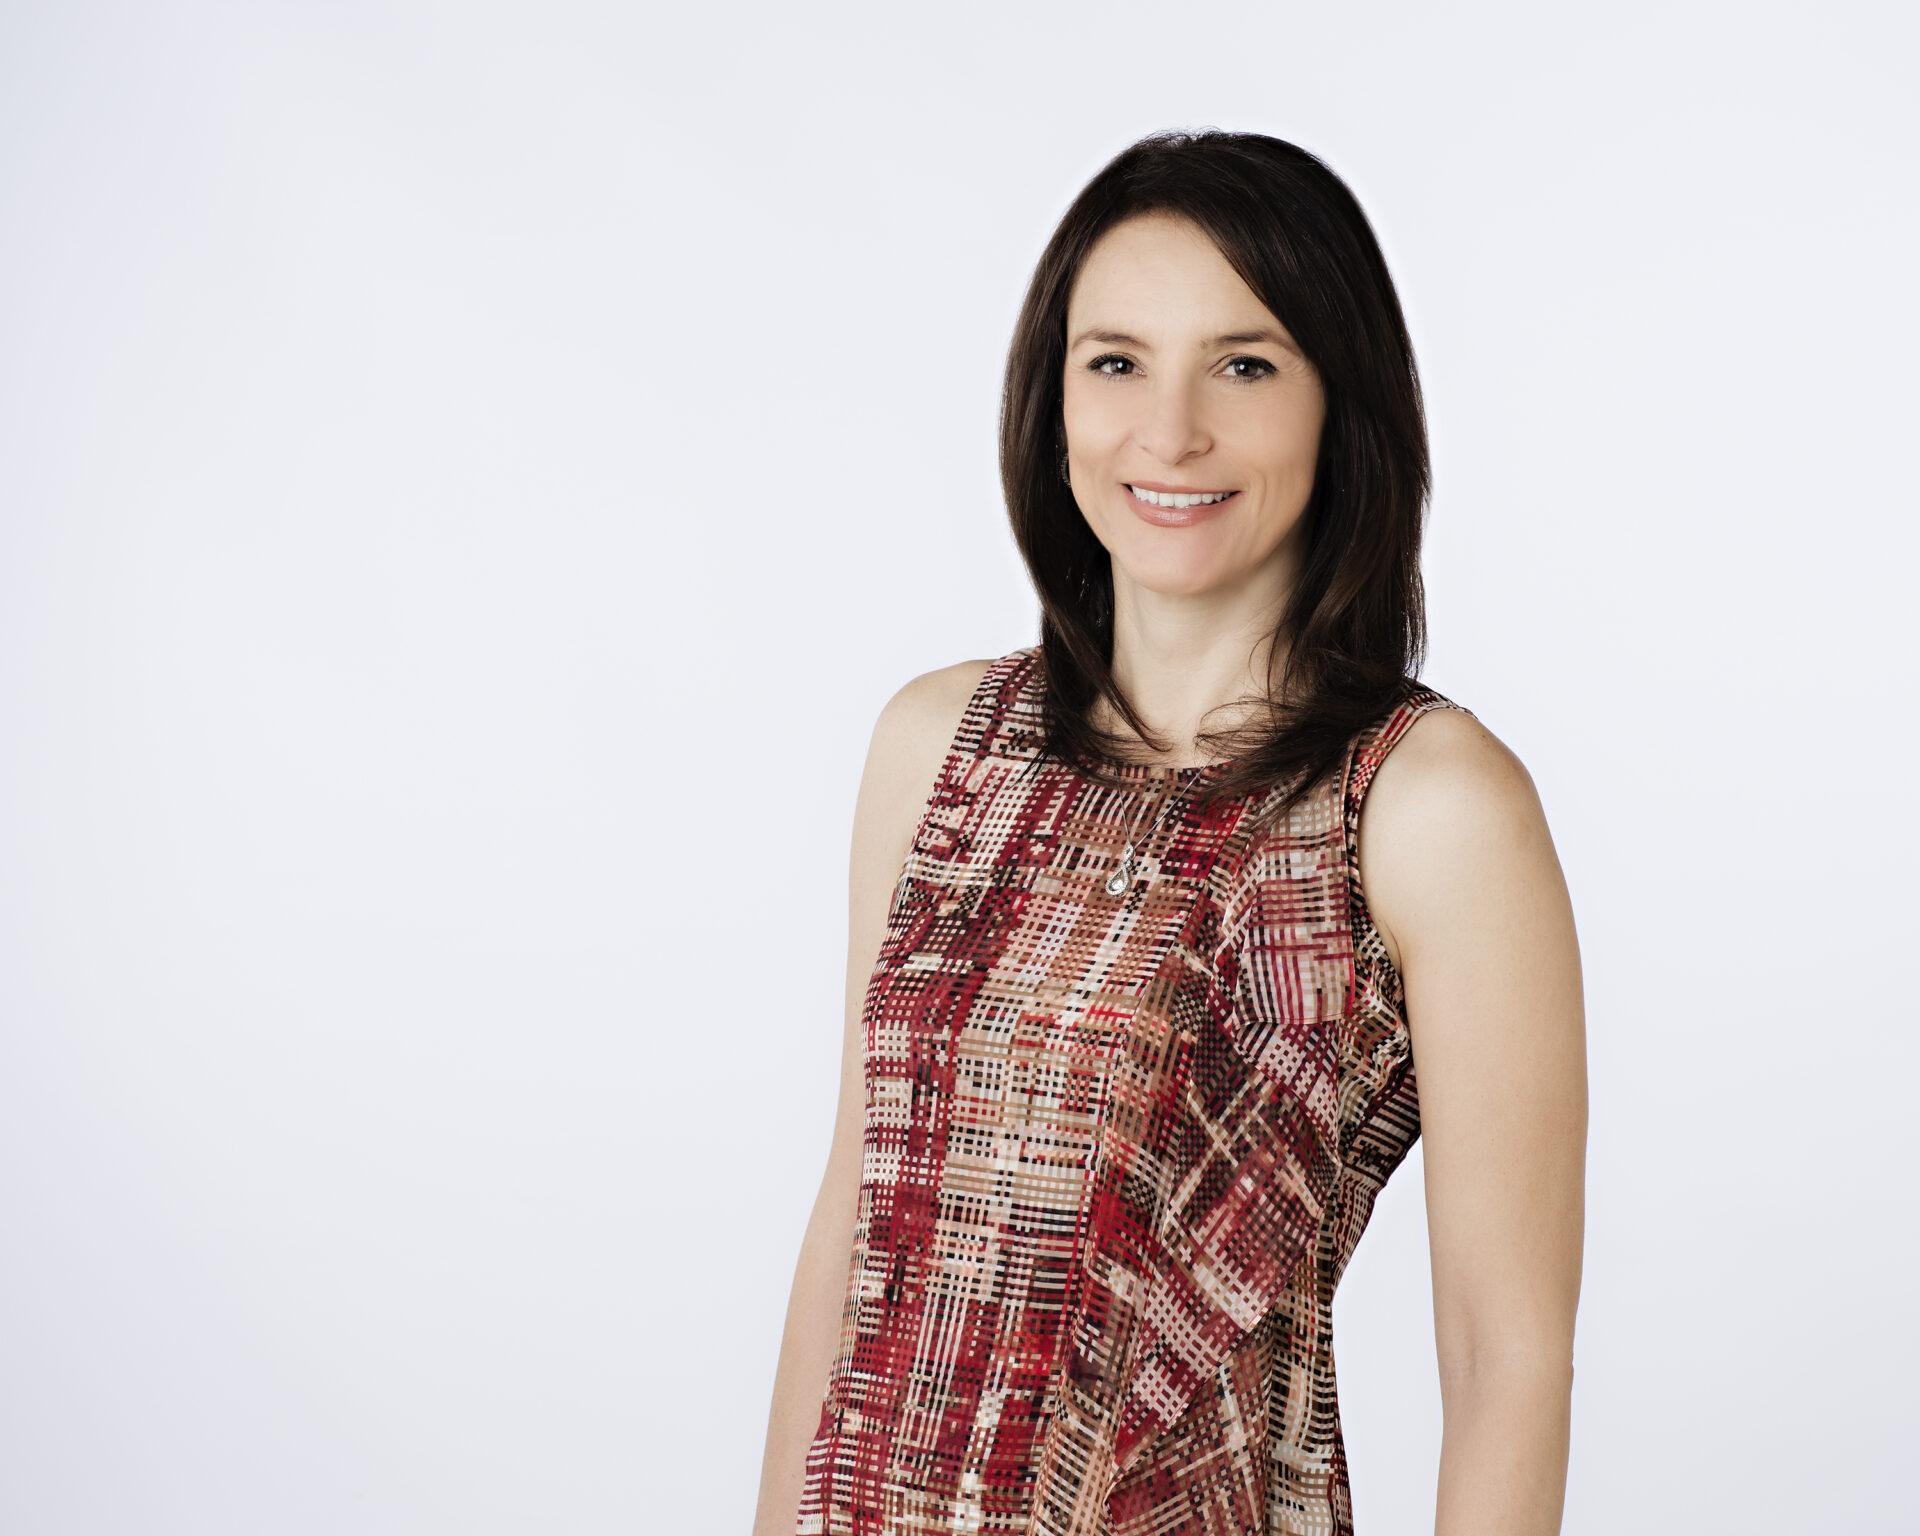 Gisella Burkman